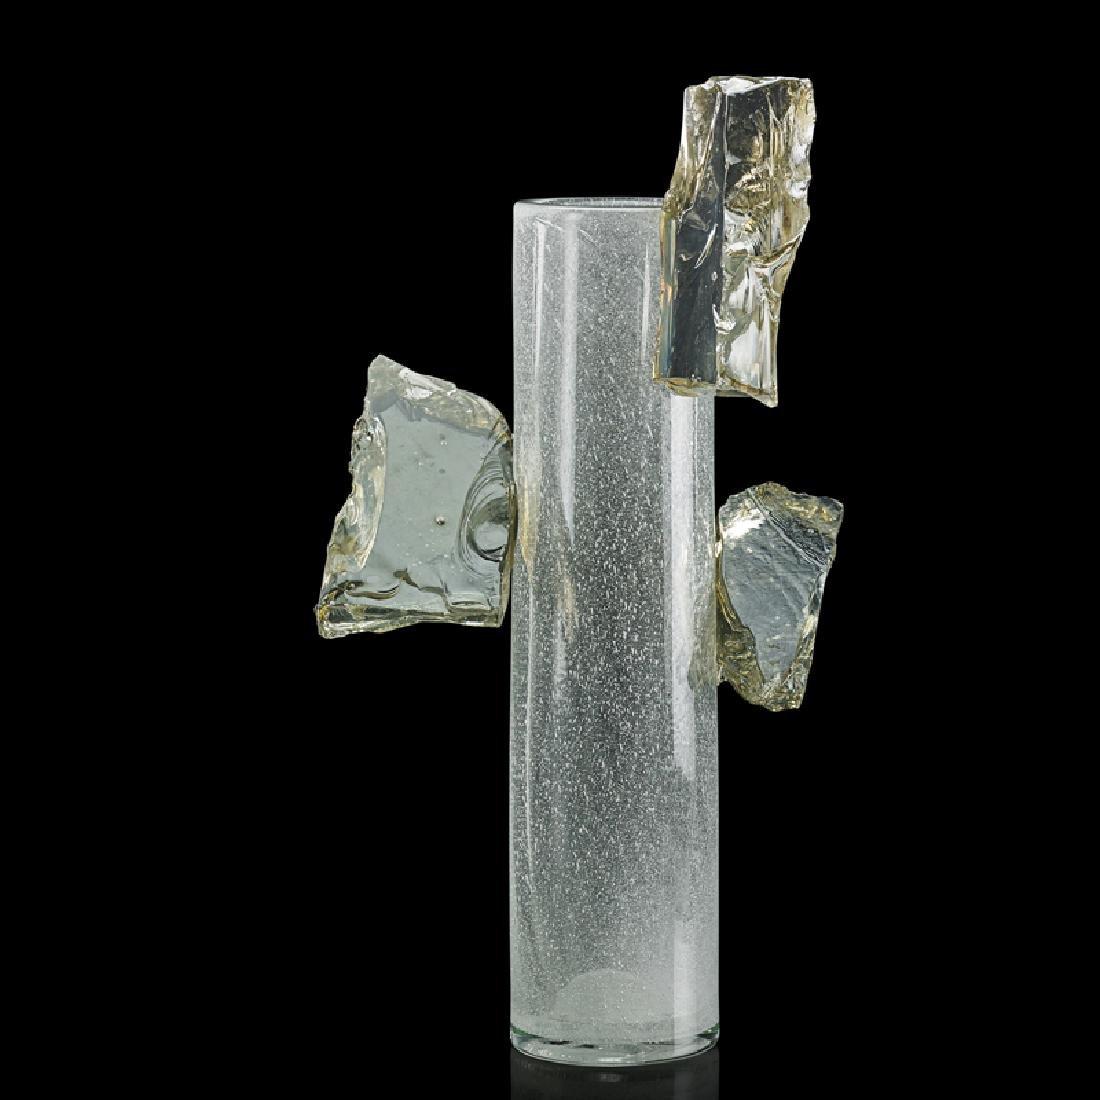 DALE CHIHULY Jerusalem Cylinder #63